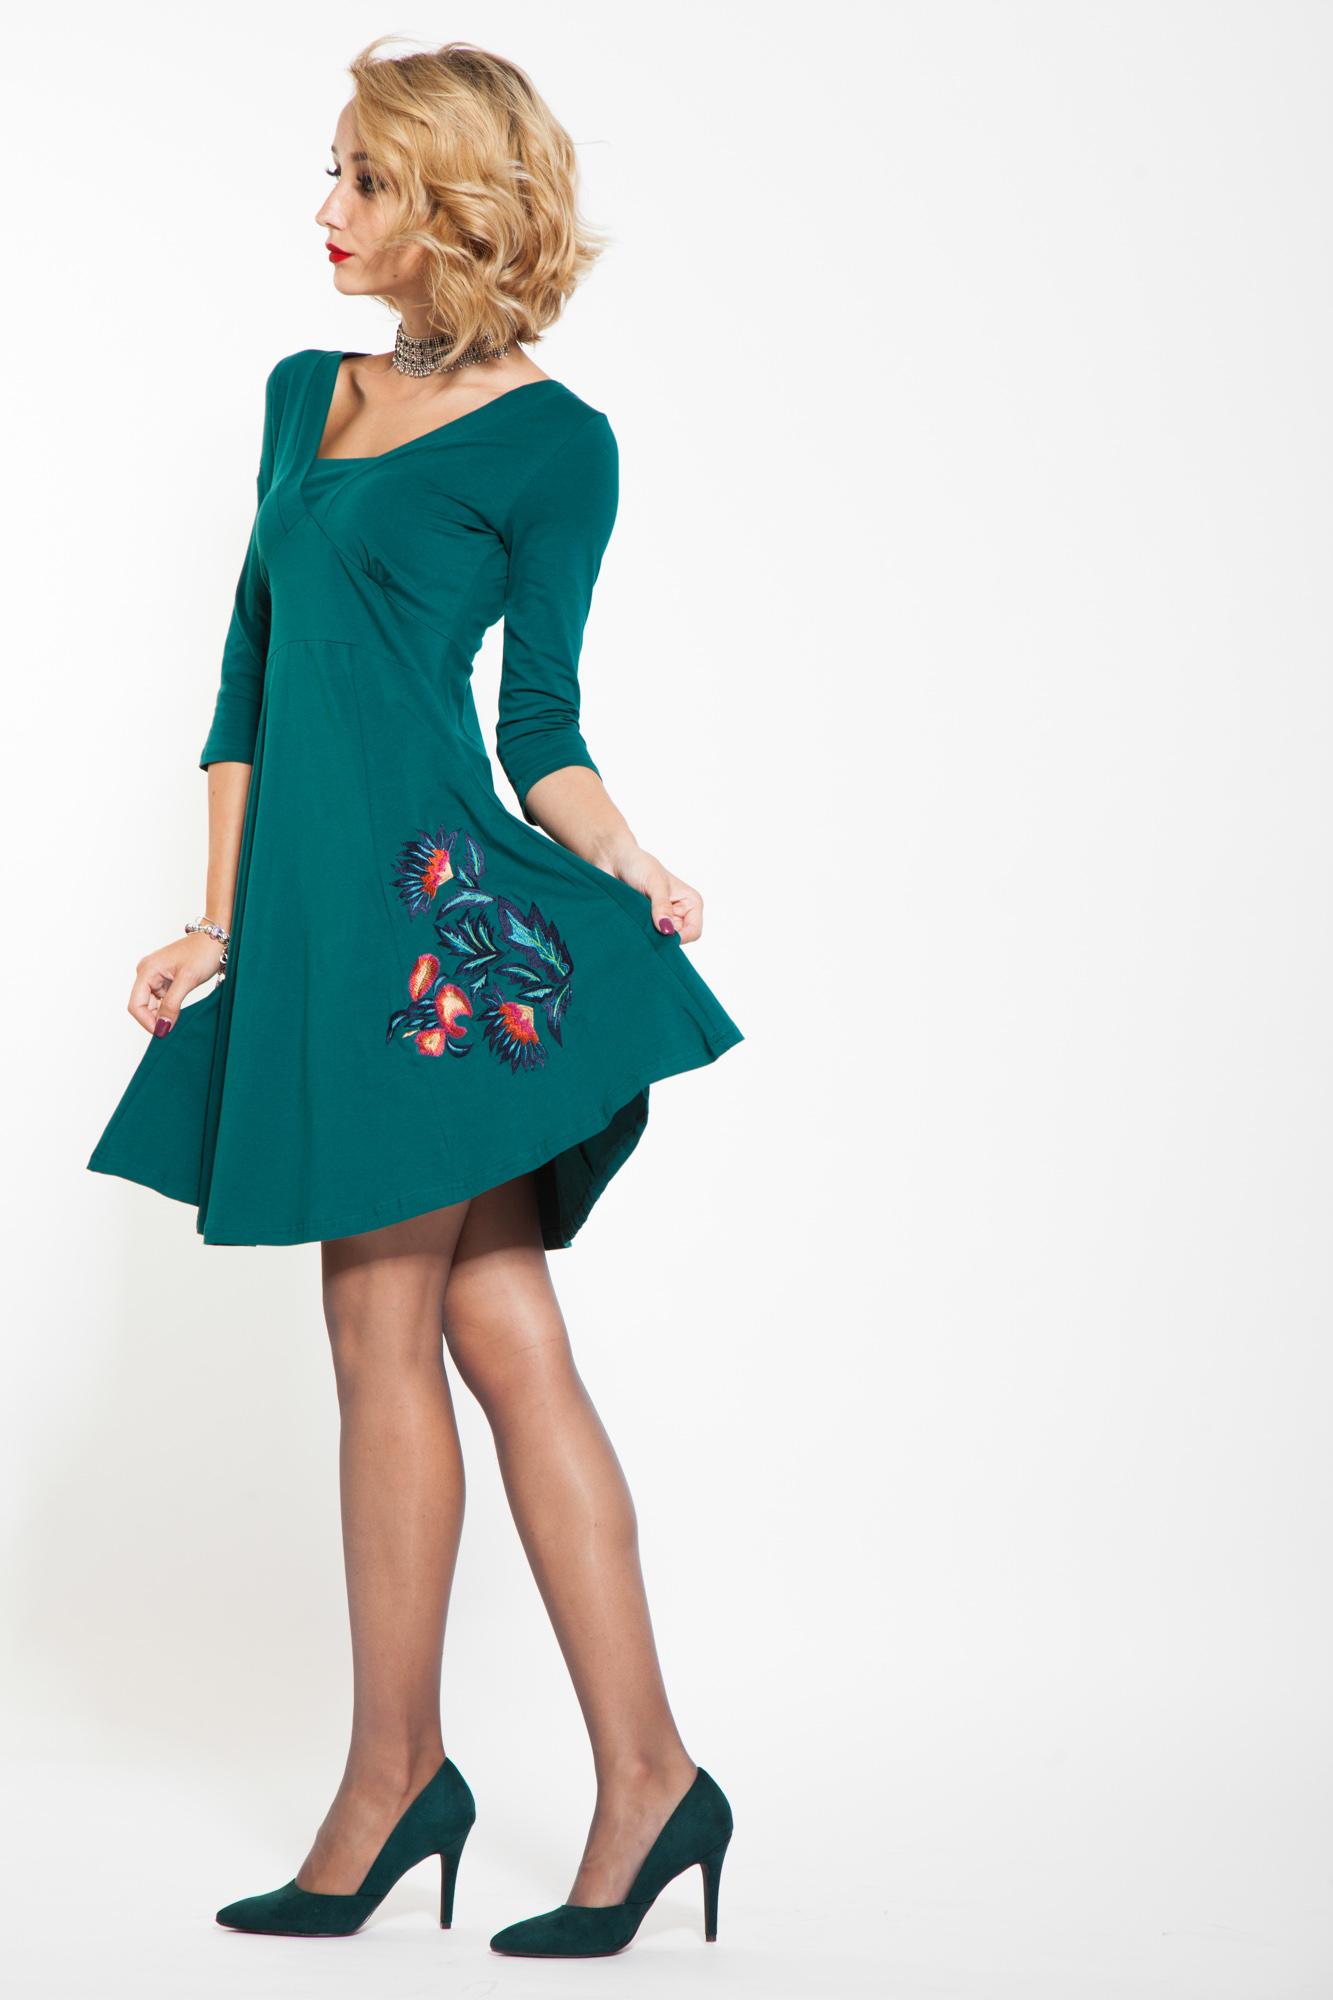 Rochie verde-turcoaz cu broderie florala